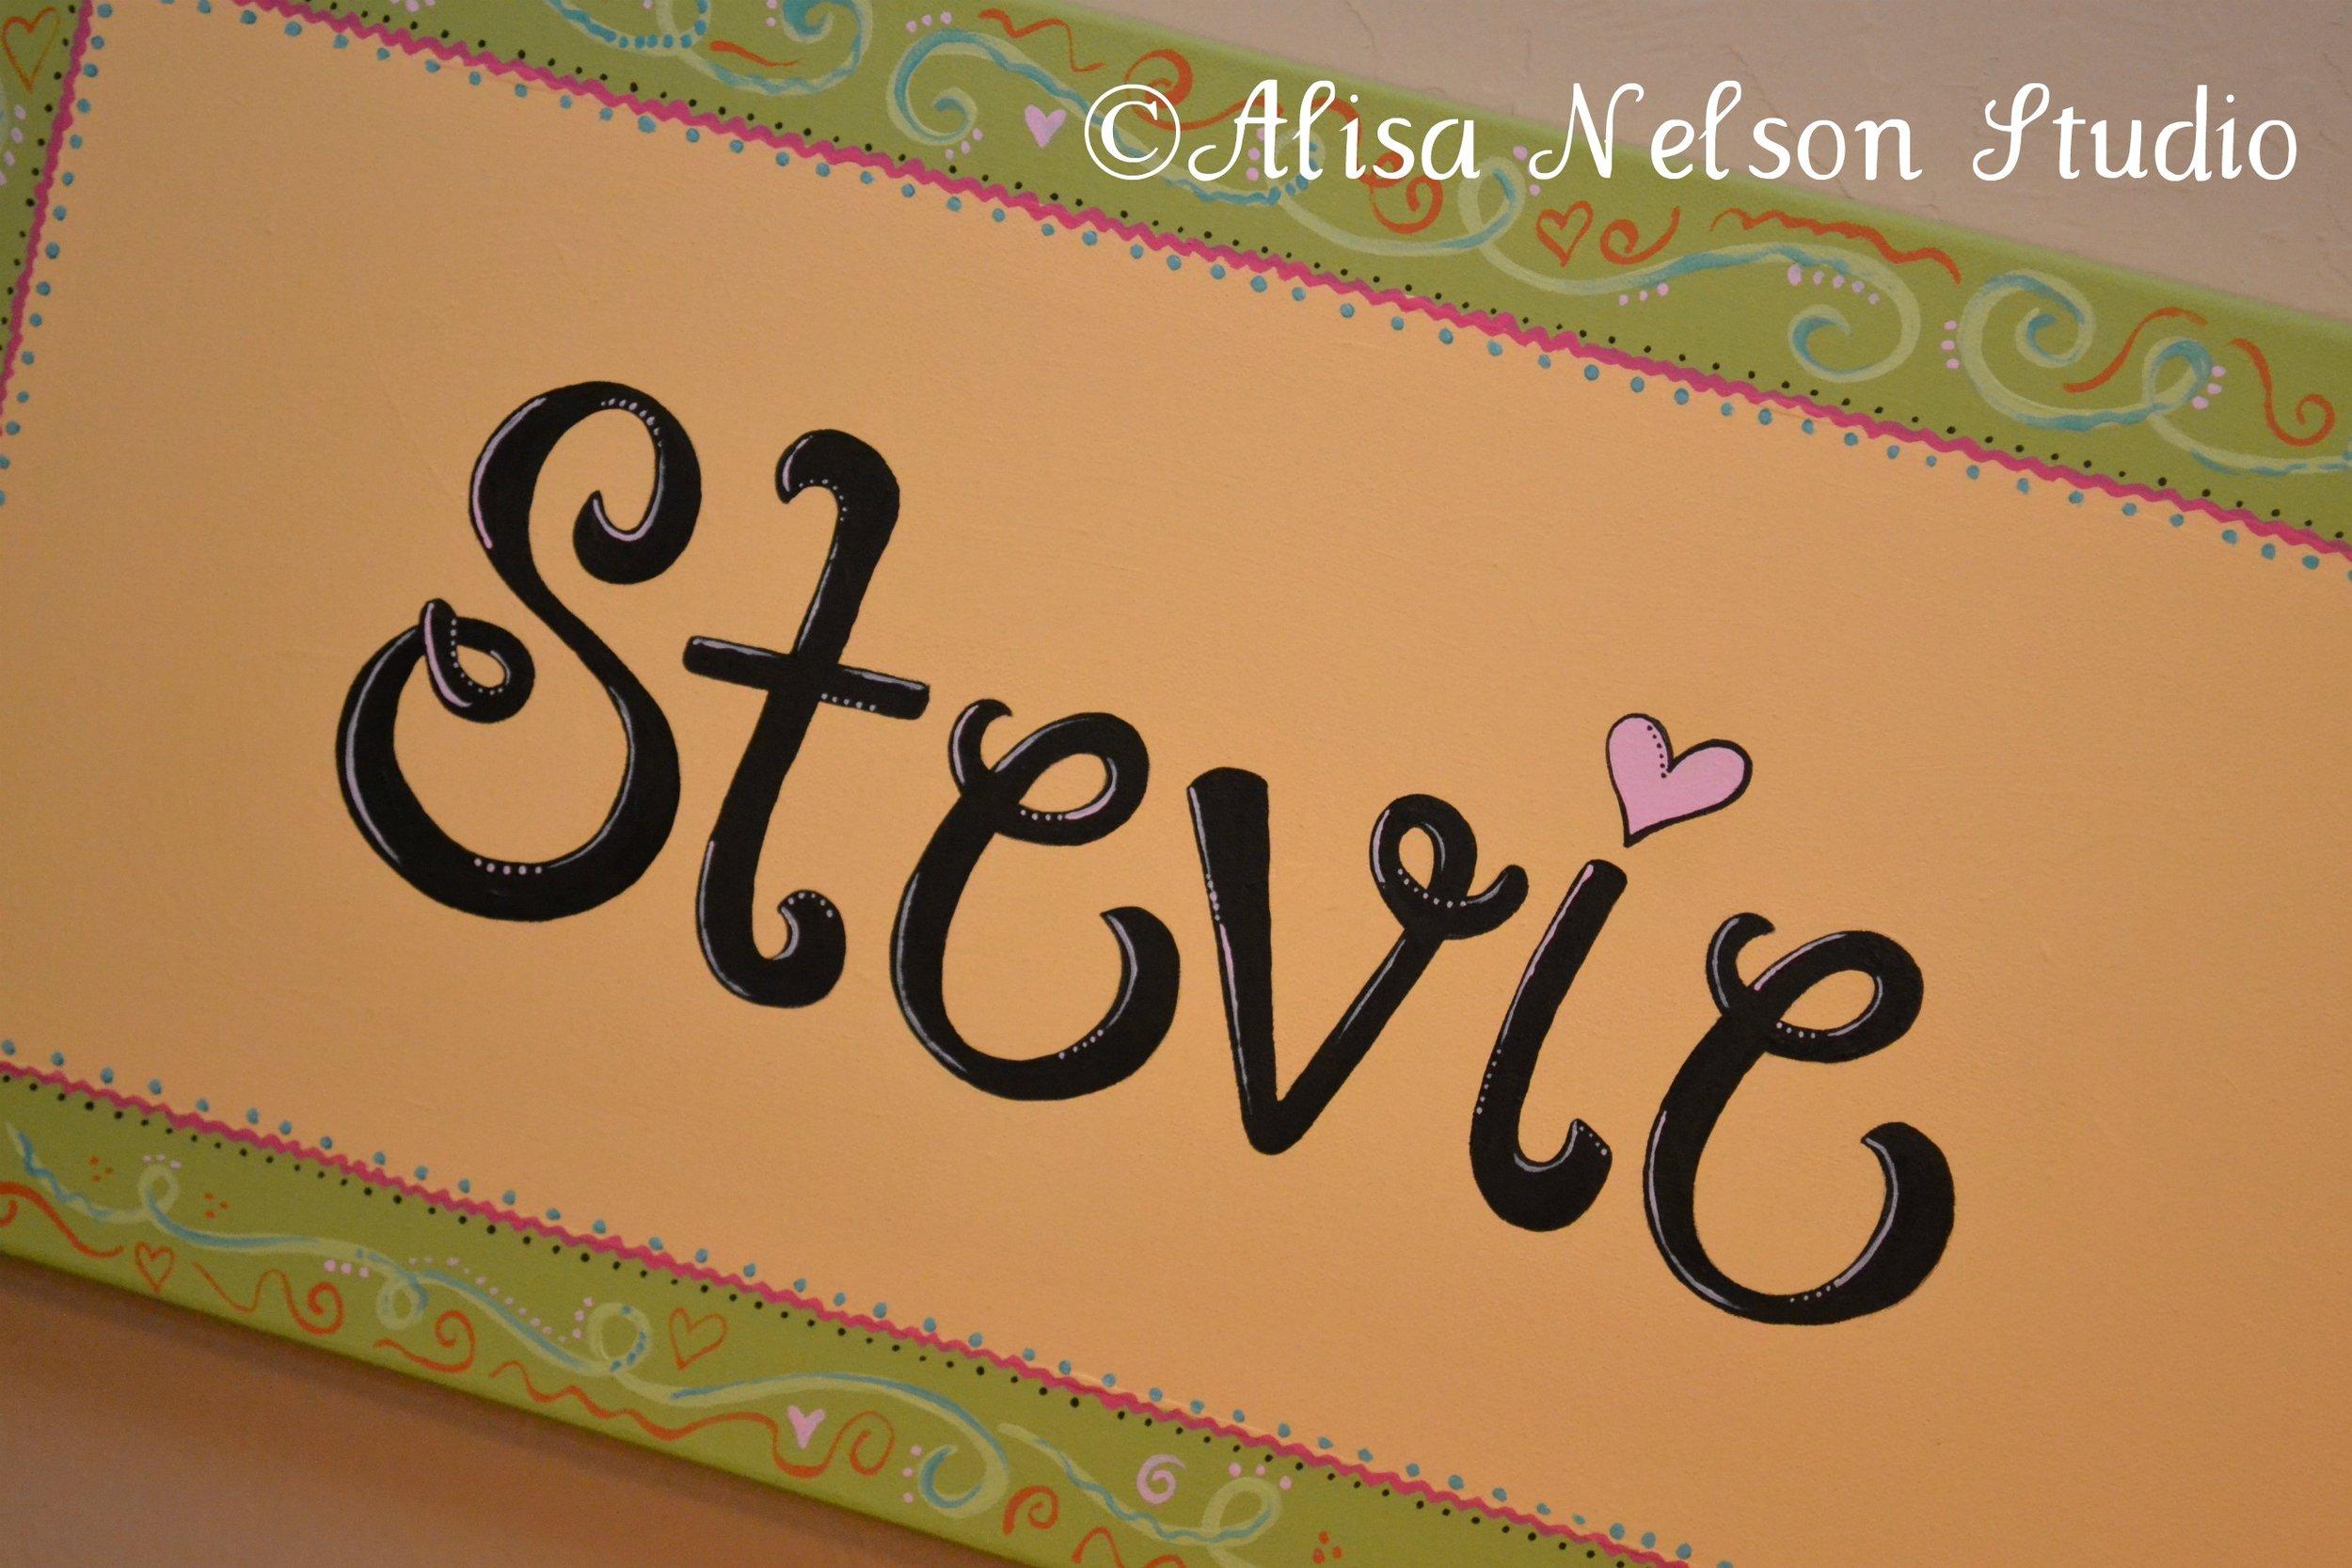 Stevie2